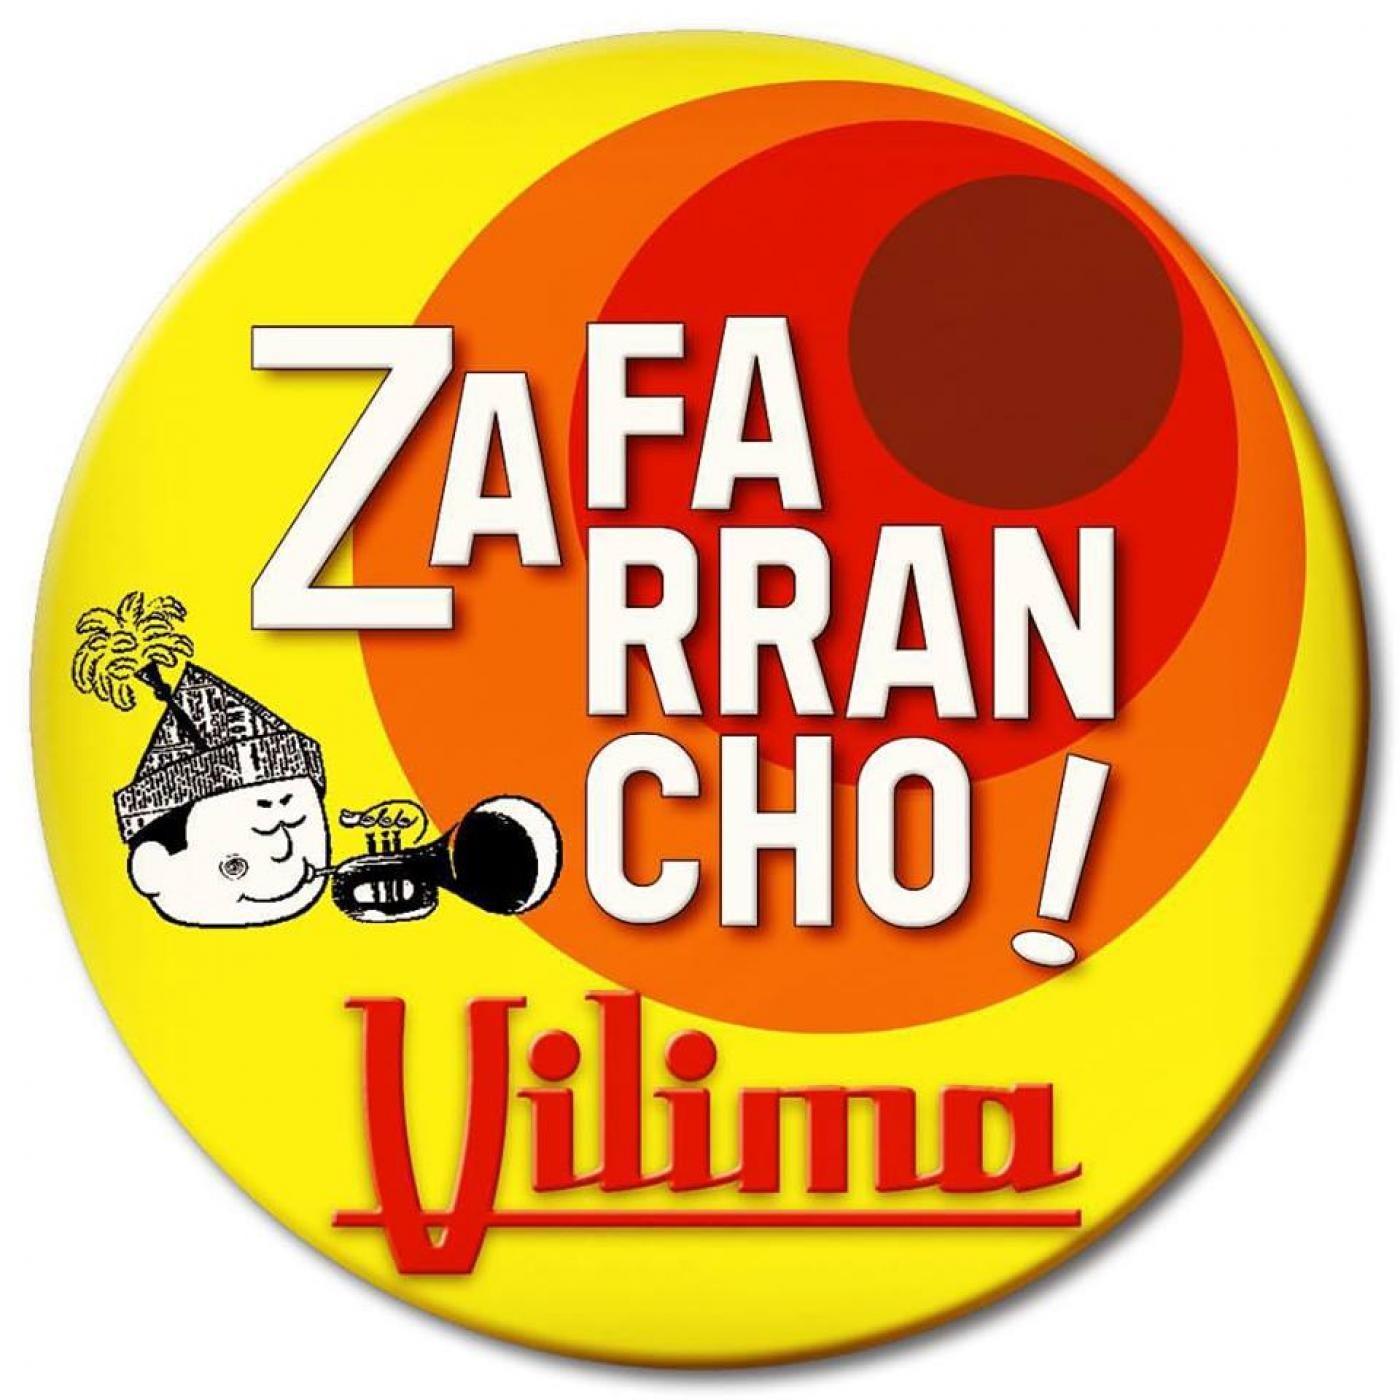 Logo de Zafarrancho Vilima